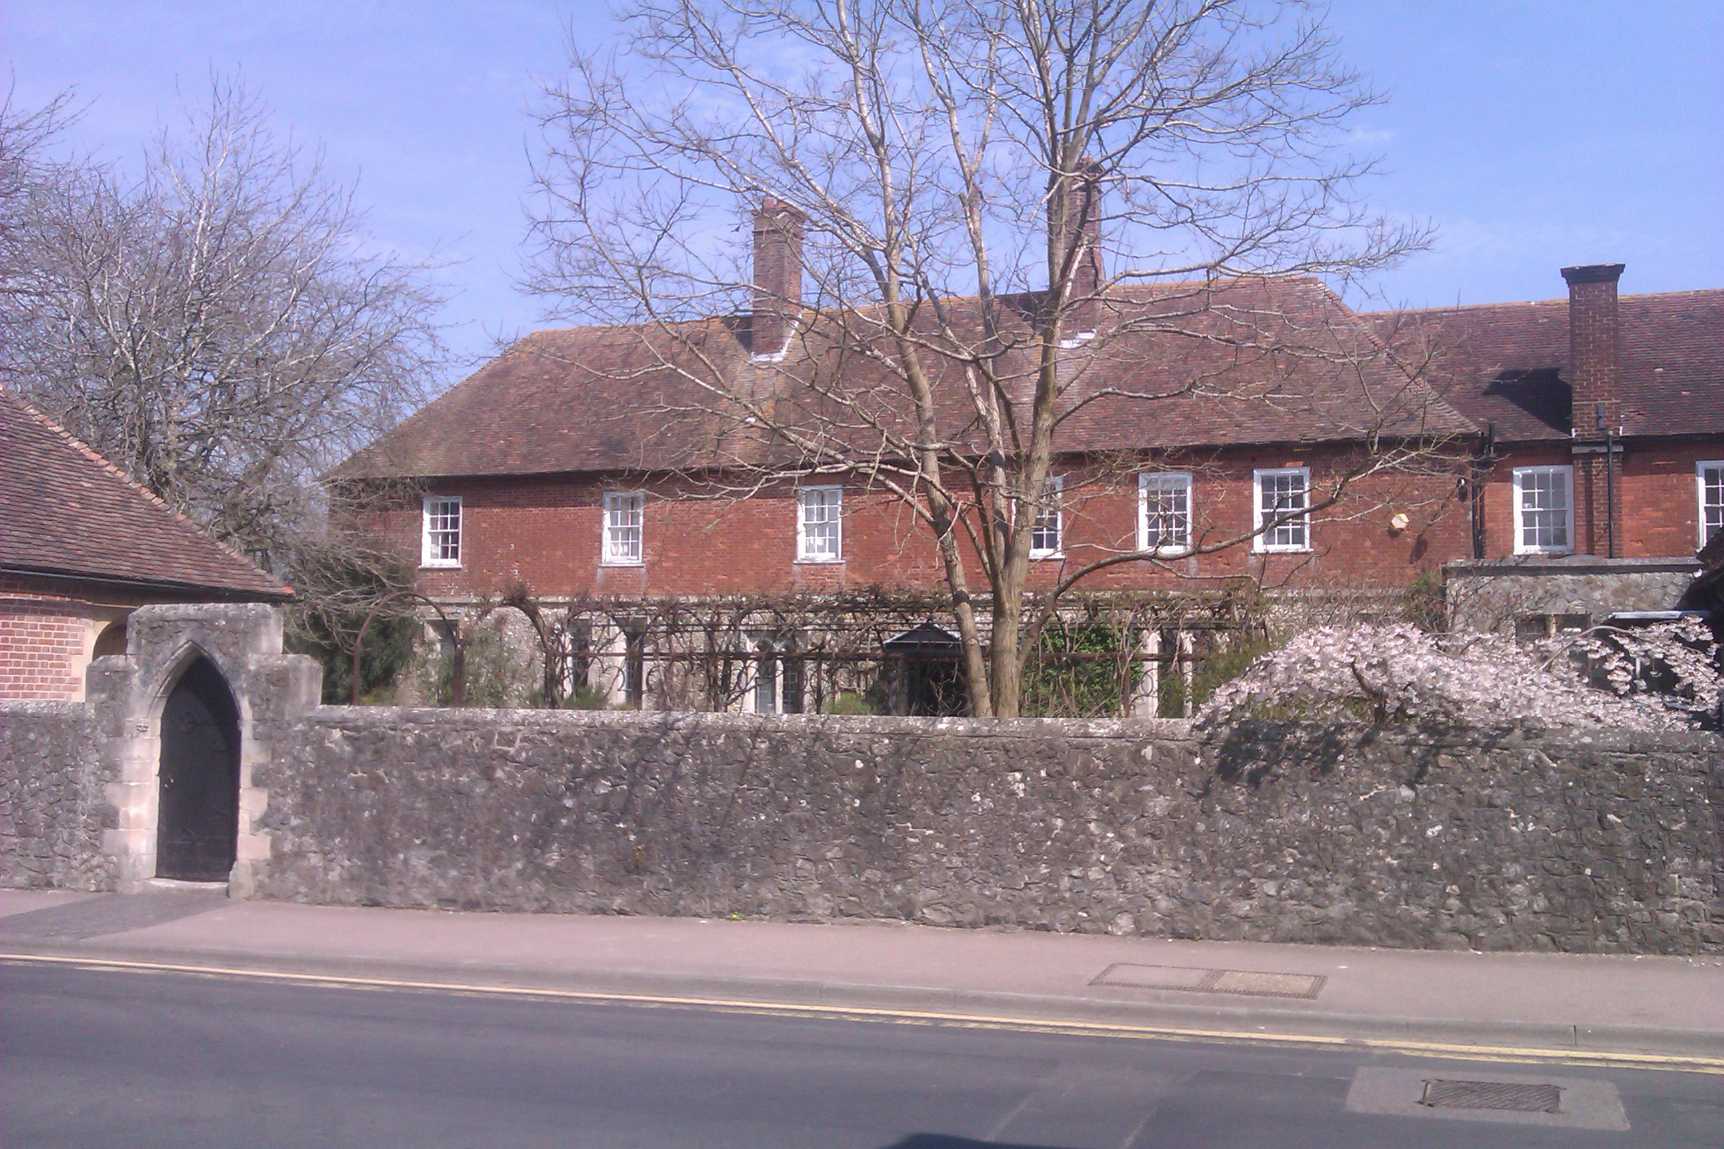 Wye College photos-7.jpg